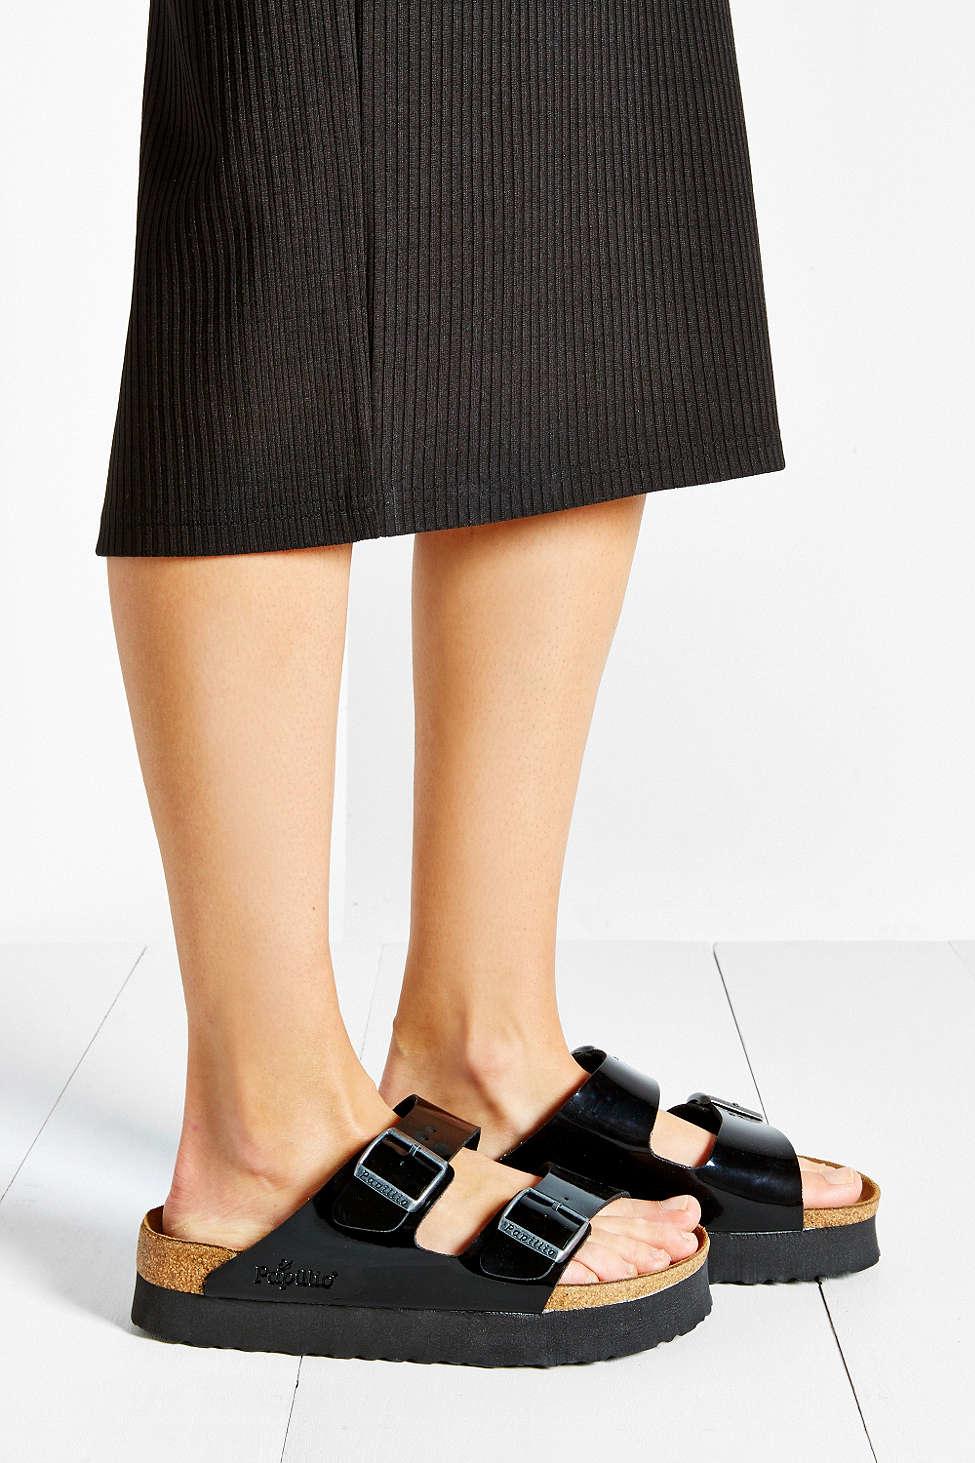 Birkenstock Shoes Size